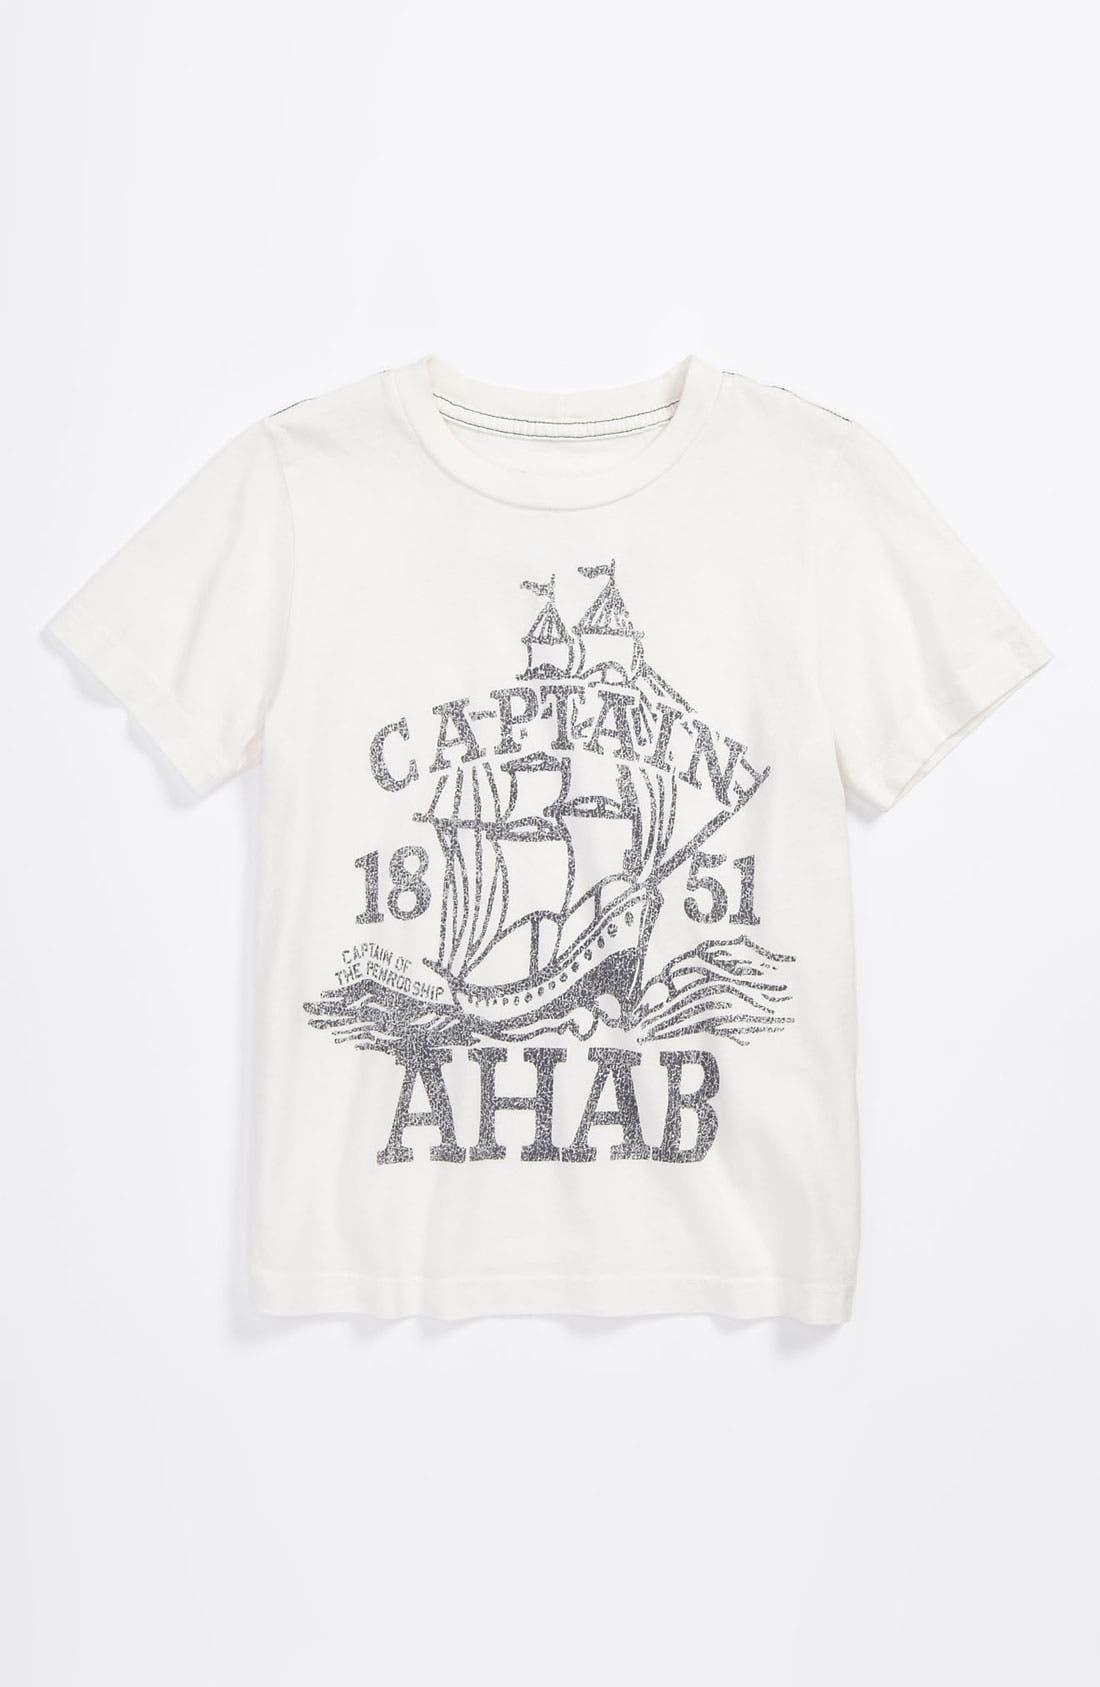 Alternate Image 1 Selected - Peek Graphic T-Shirt (Toddler, Little Boys & Big Boys)